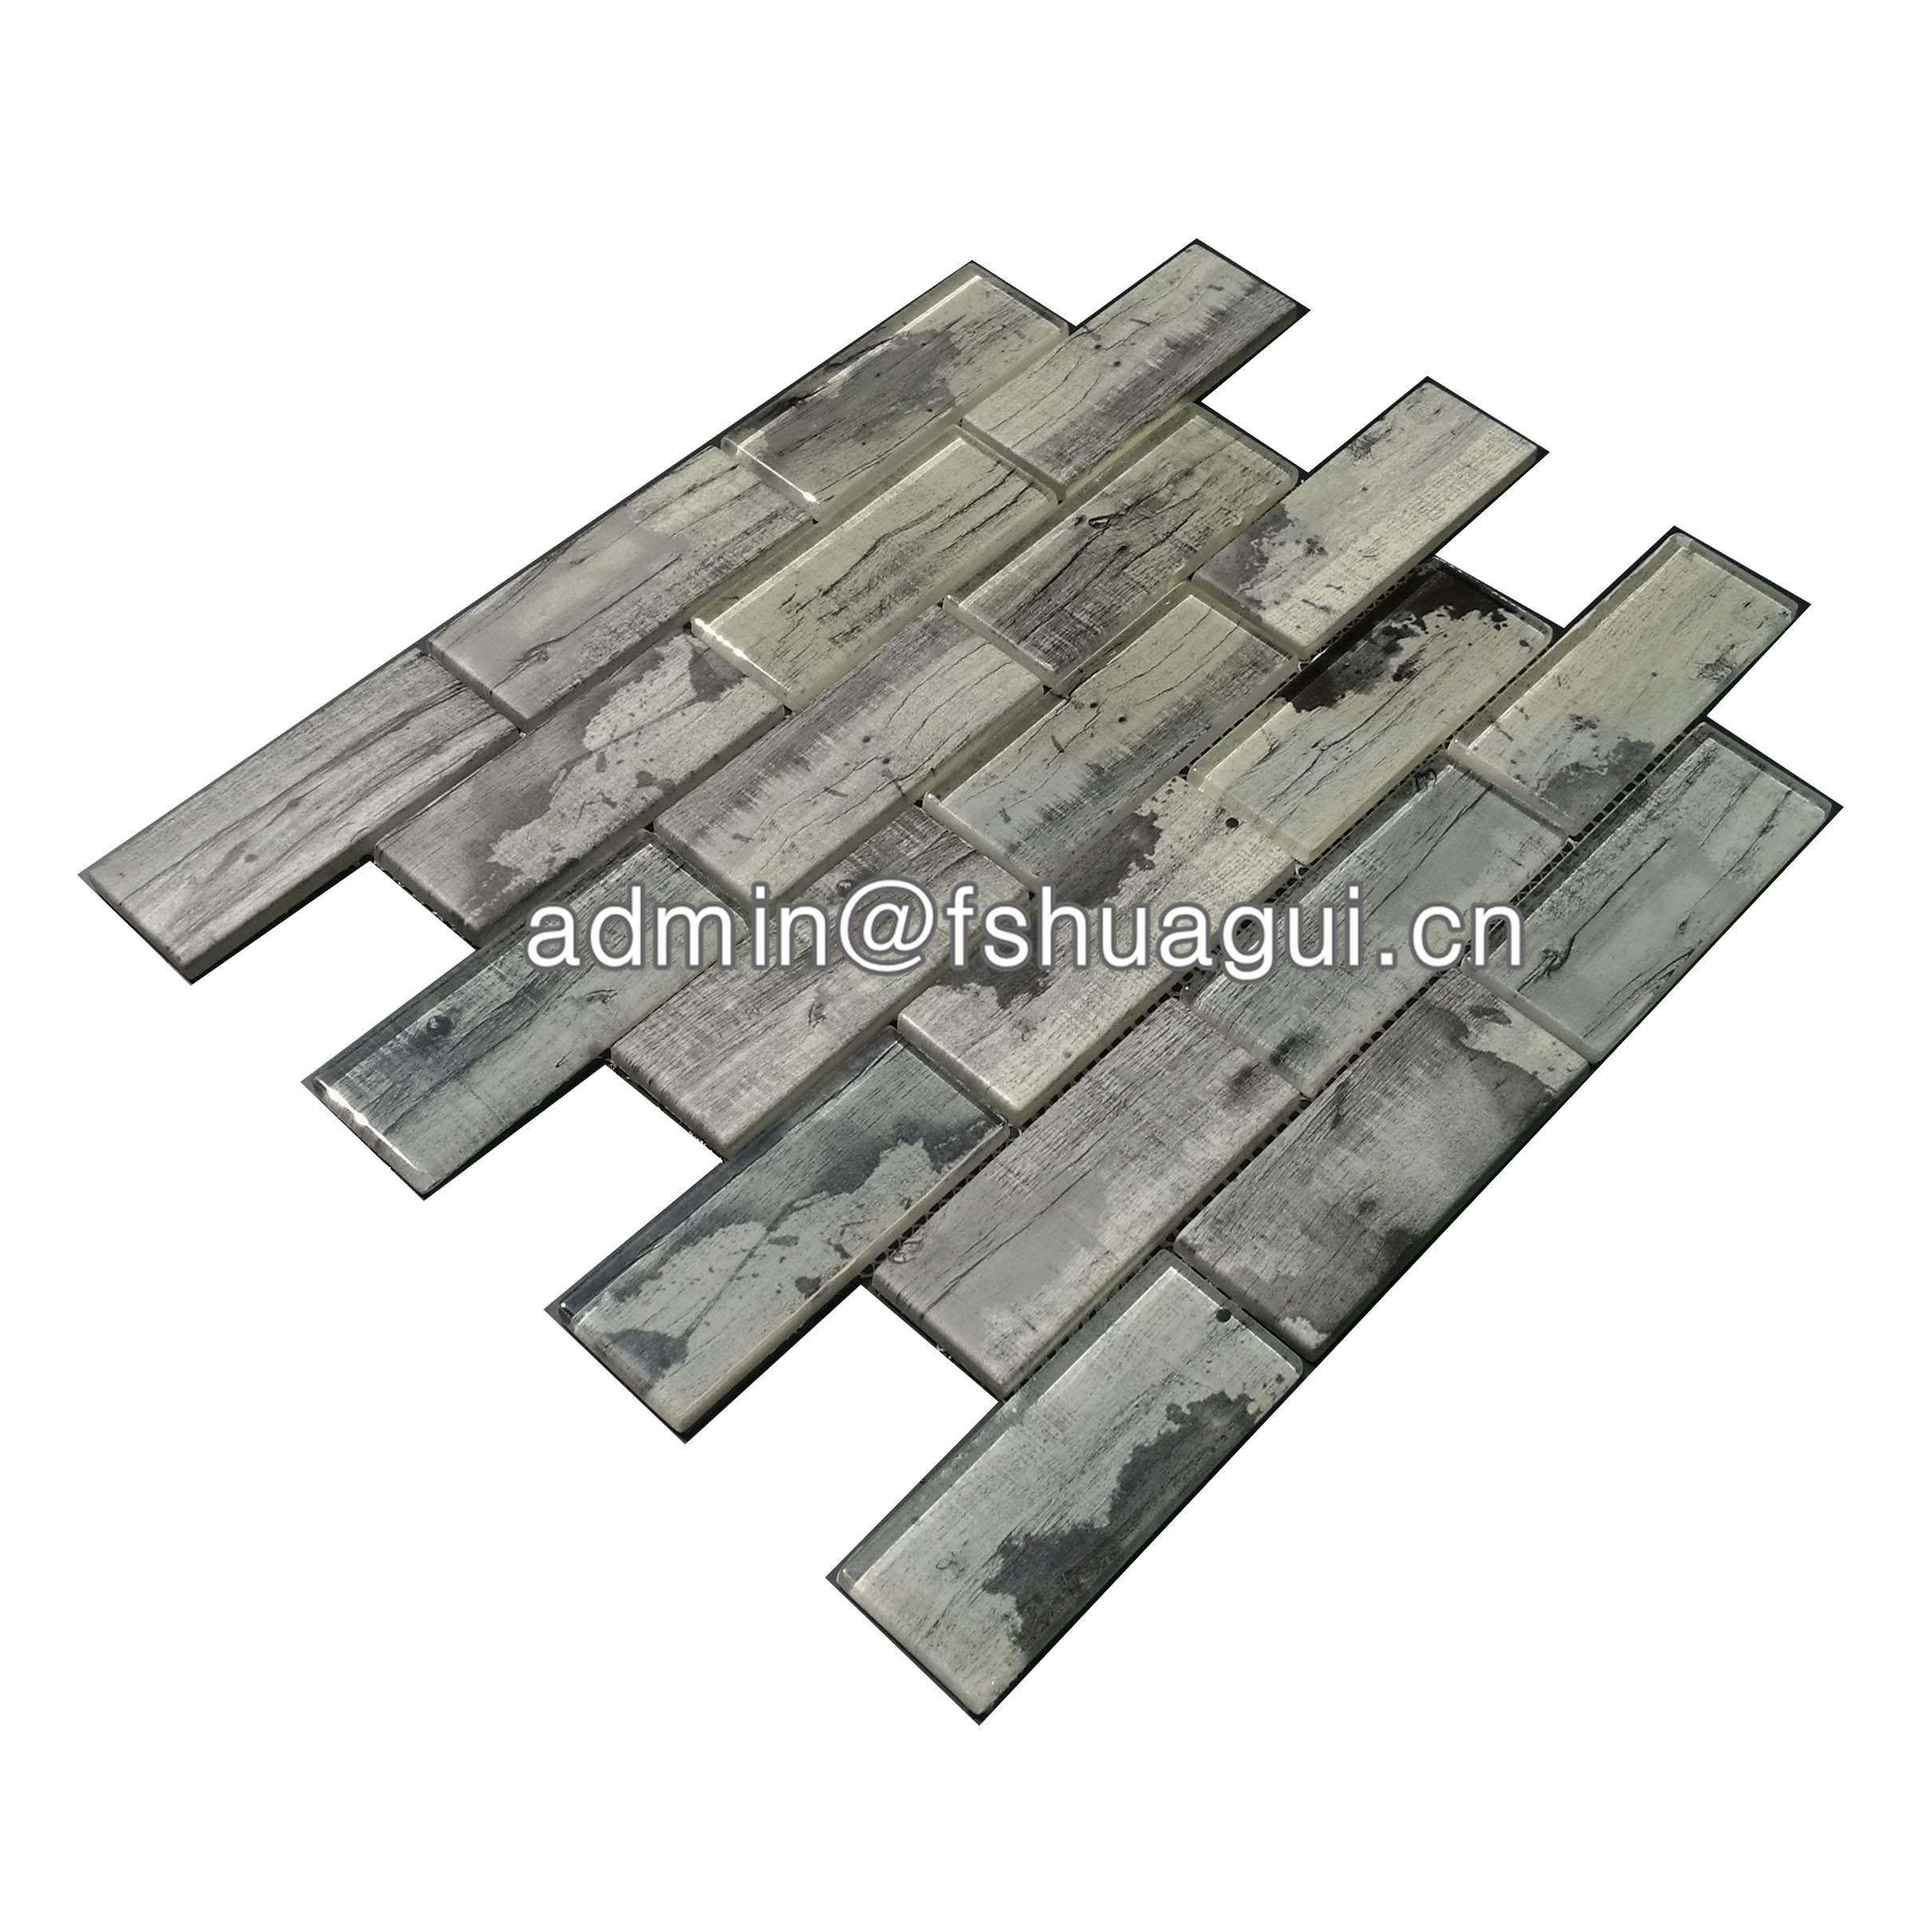 Huagui Grey inkjet brick glass subway tile around fireplace  HG-WJ413 GLASS SUBWAY TILE image2